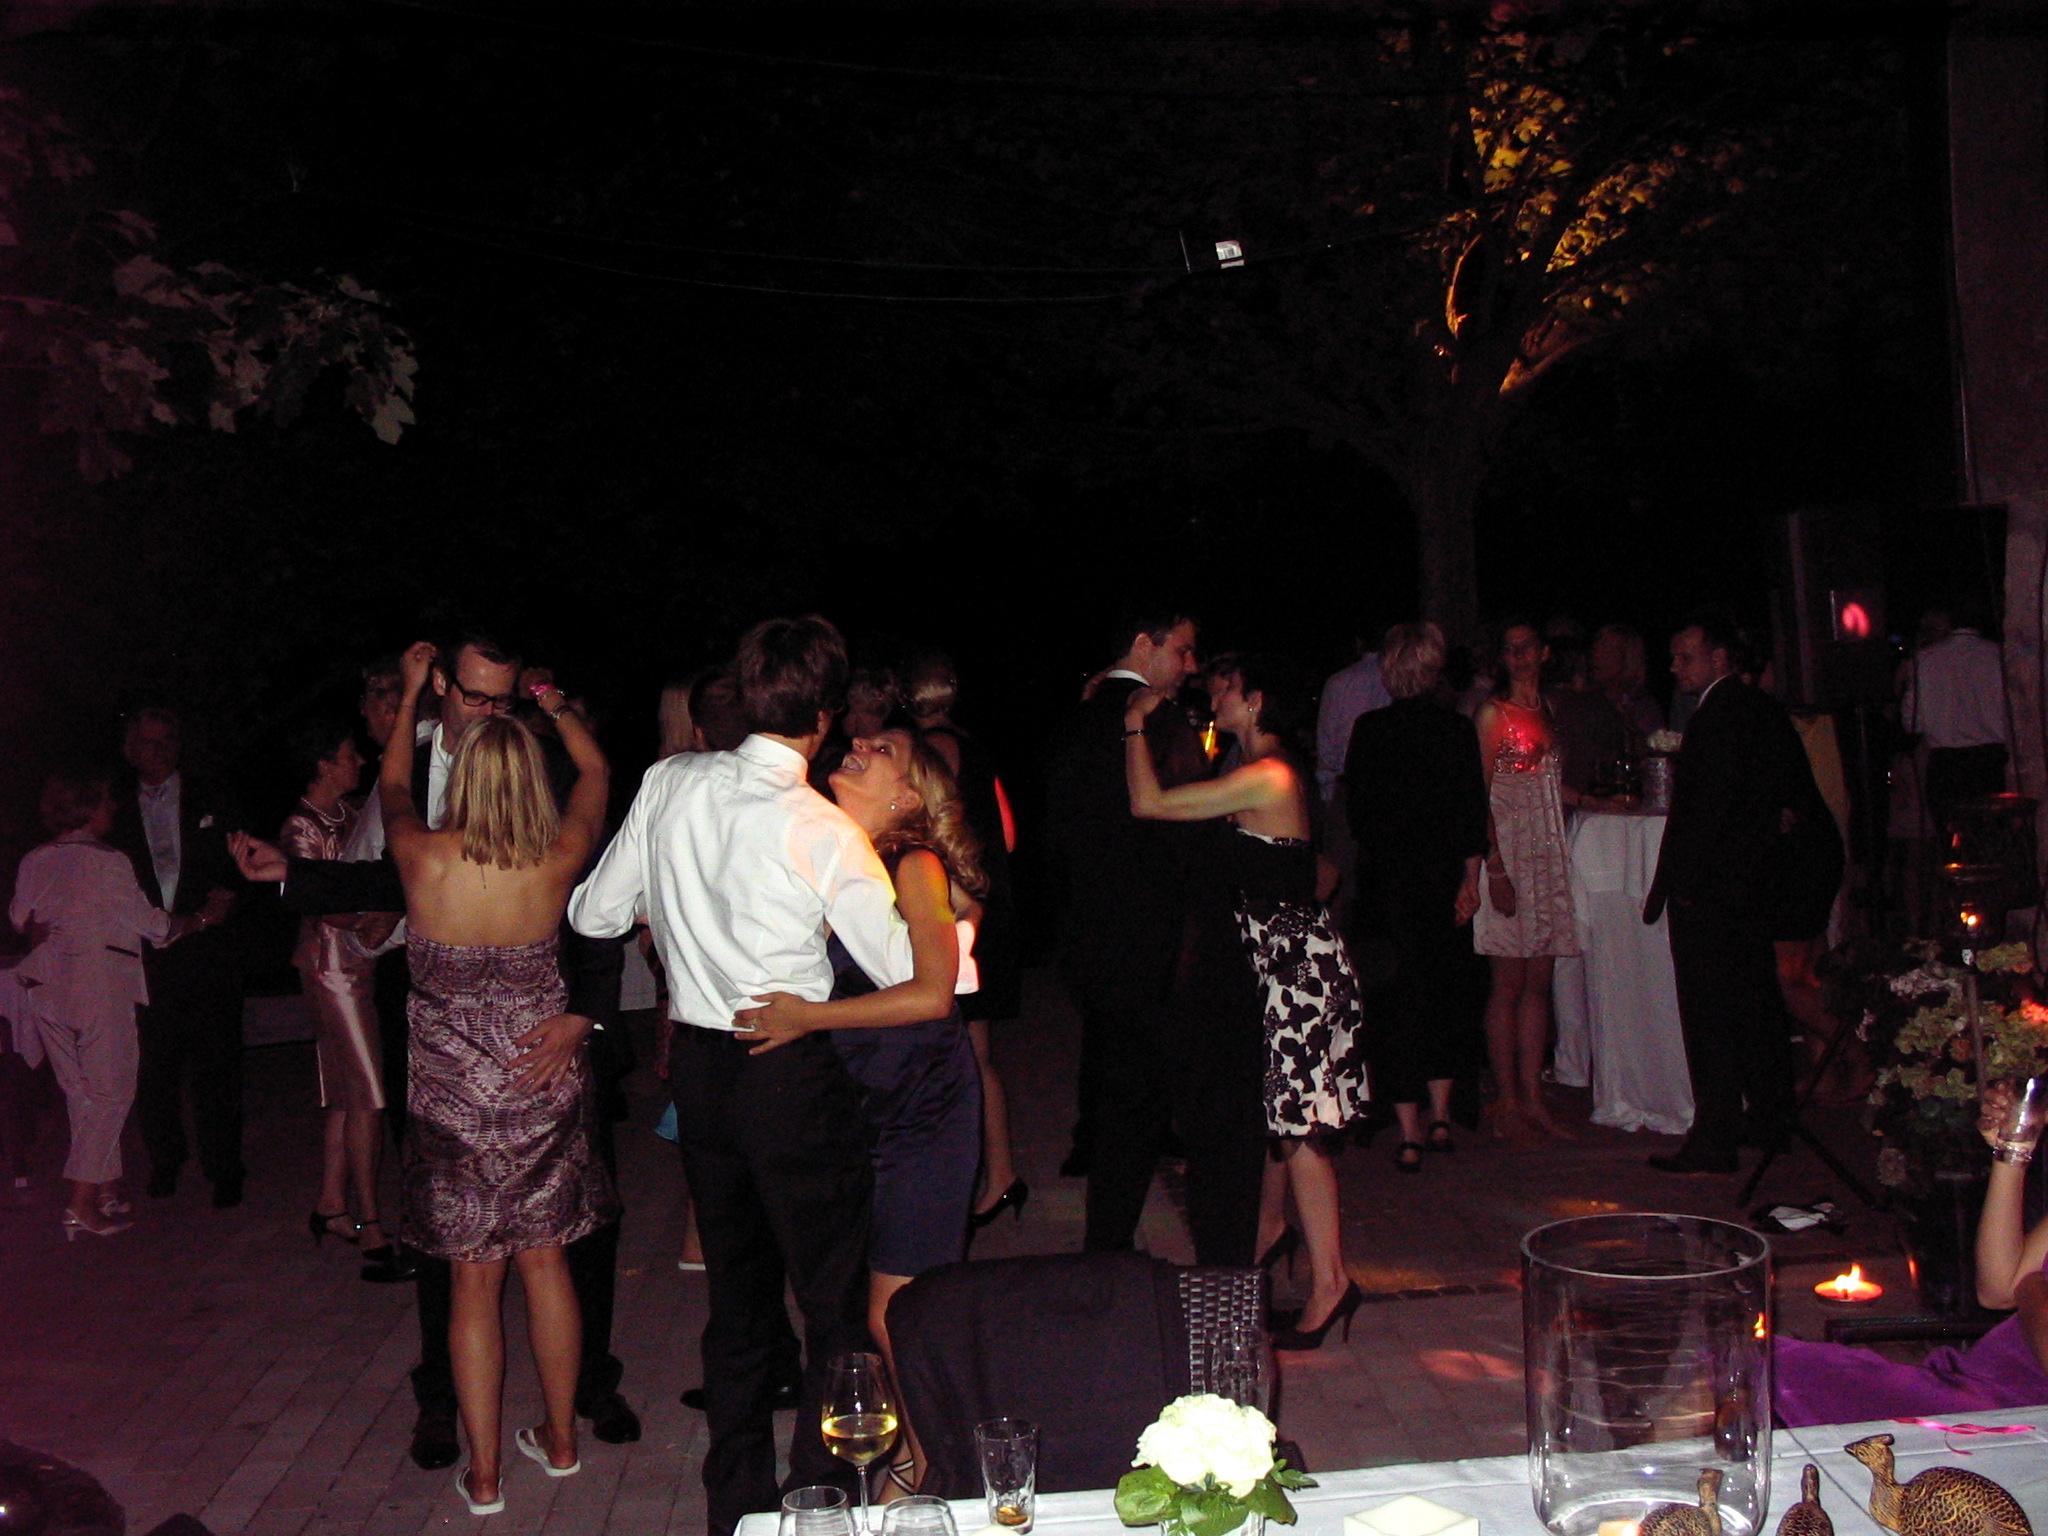 Hochzeit - romantisch - Hochzeitsdj - Party | DJ TONY P